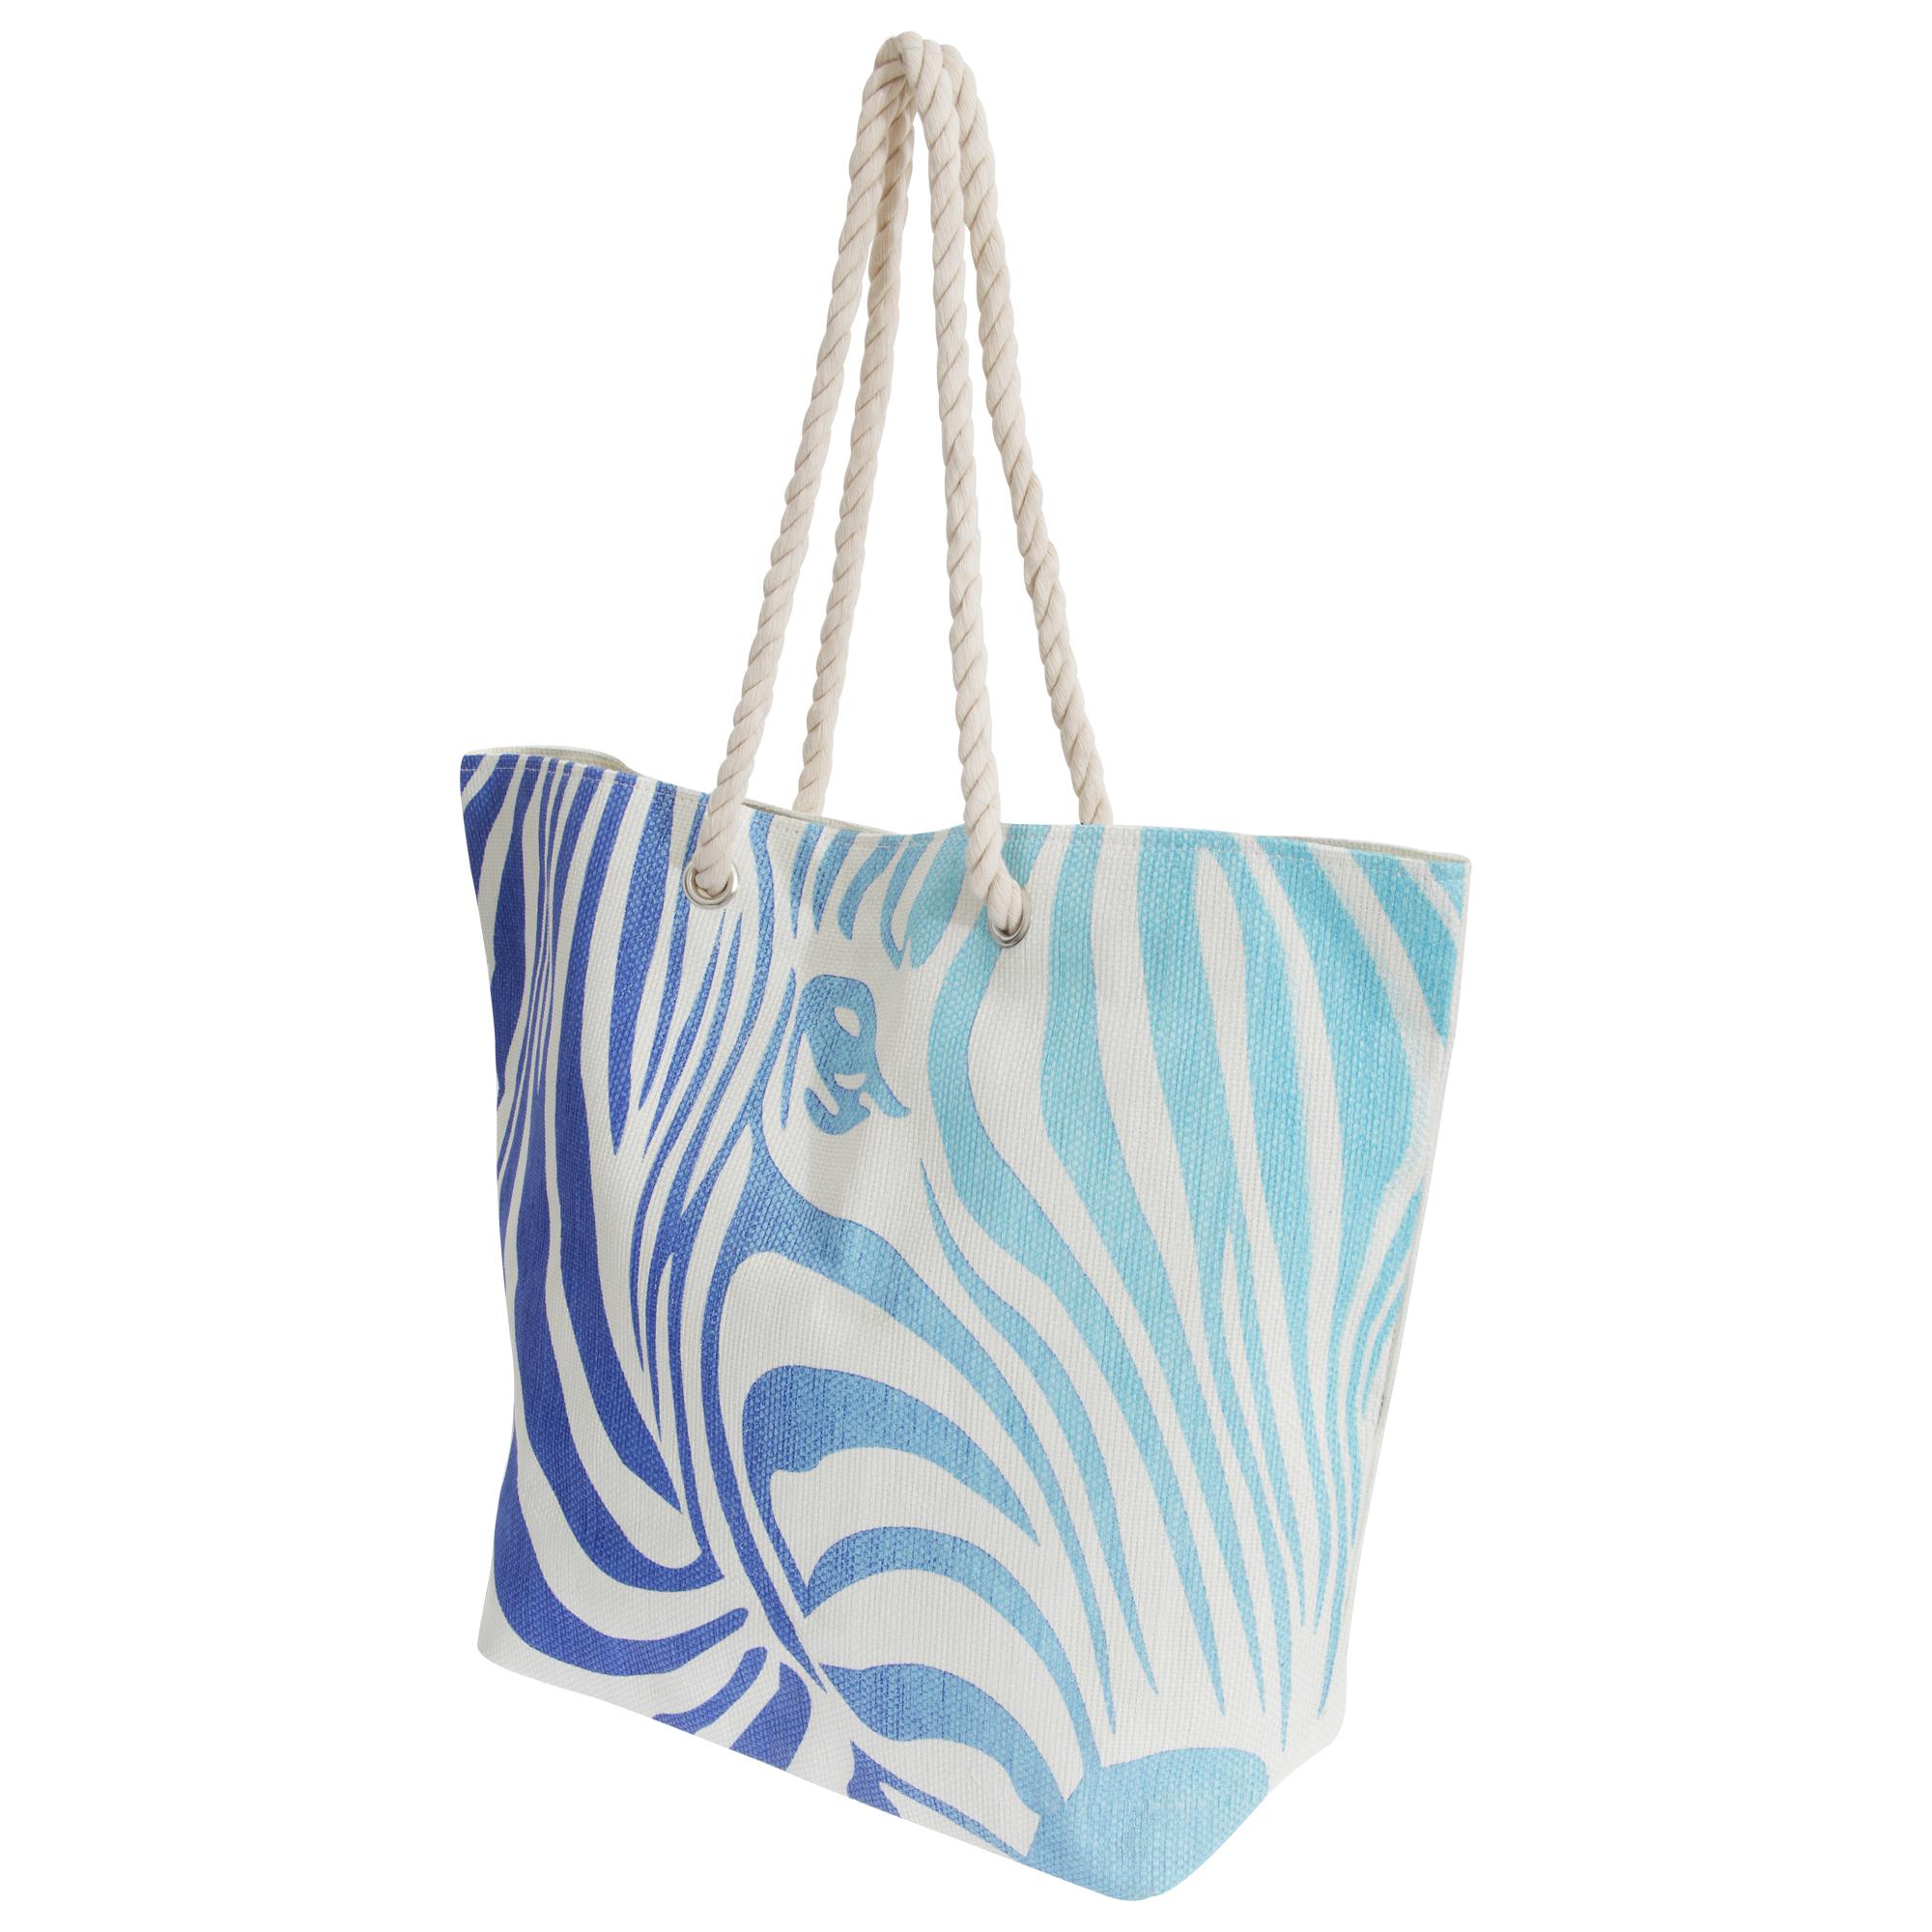 FLOSO Womens/Ladies Zebra Stripe Patterned Straw Woven Summer Handbag (One Size) (White/Blue)